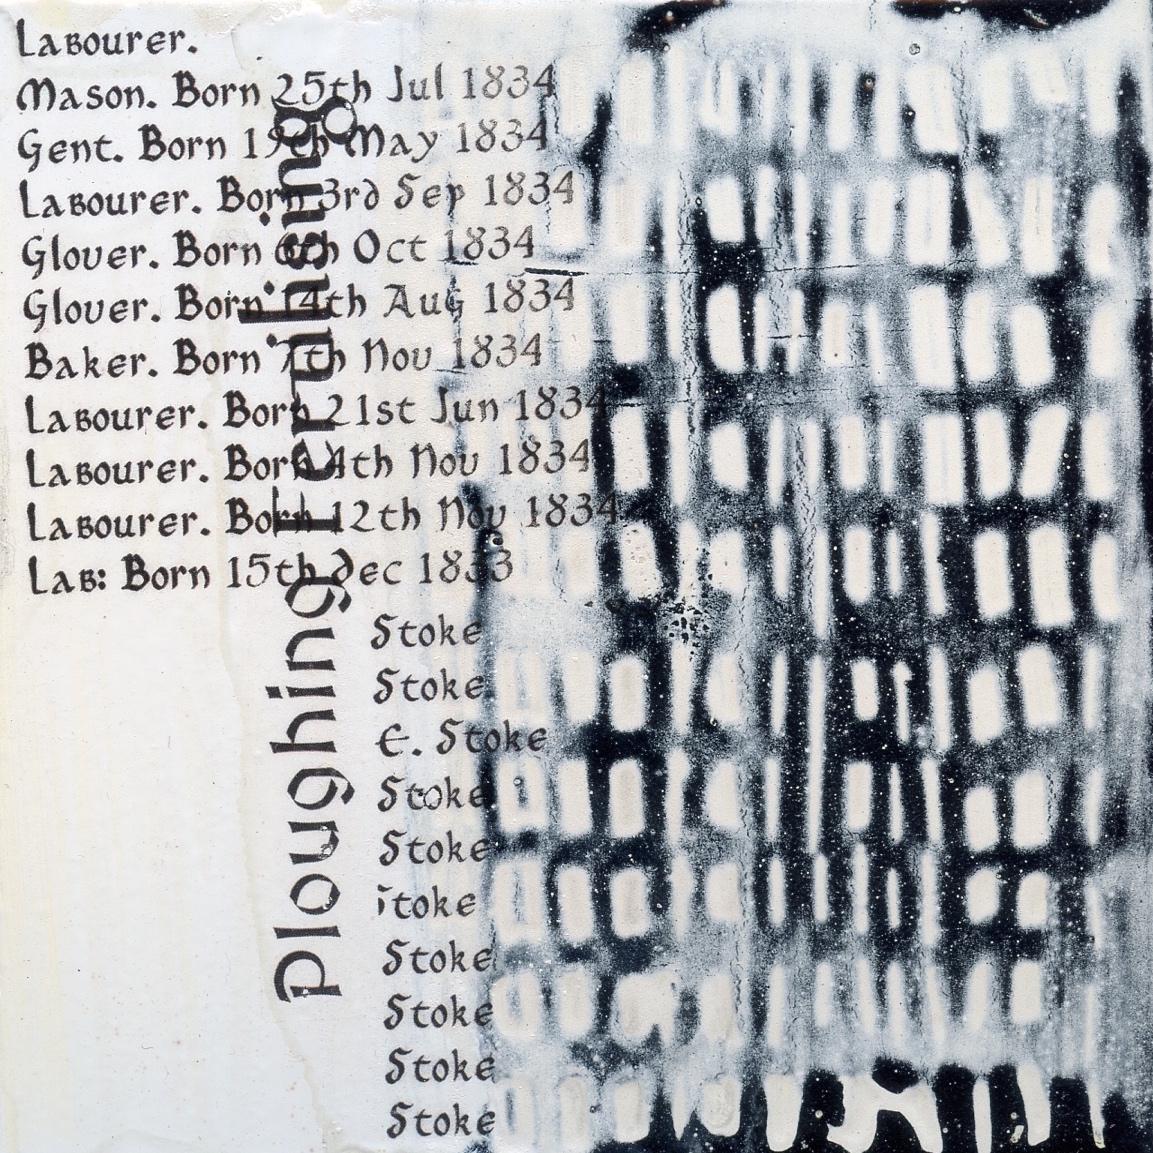 'Labourer mason'